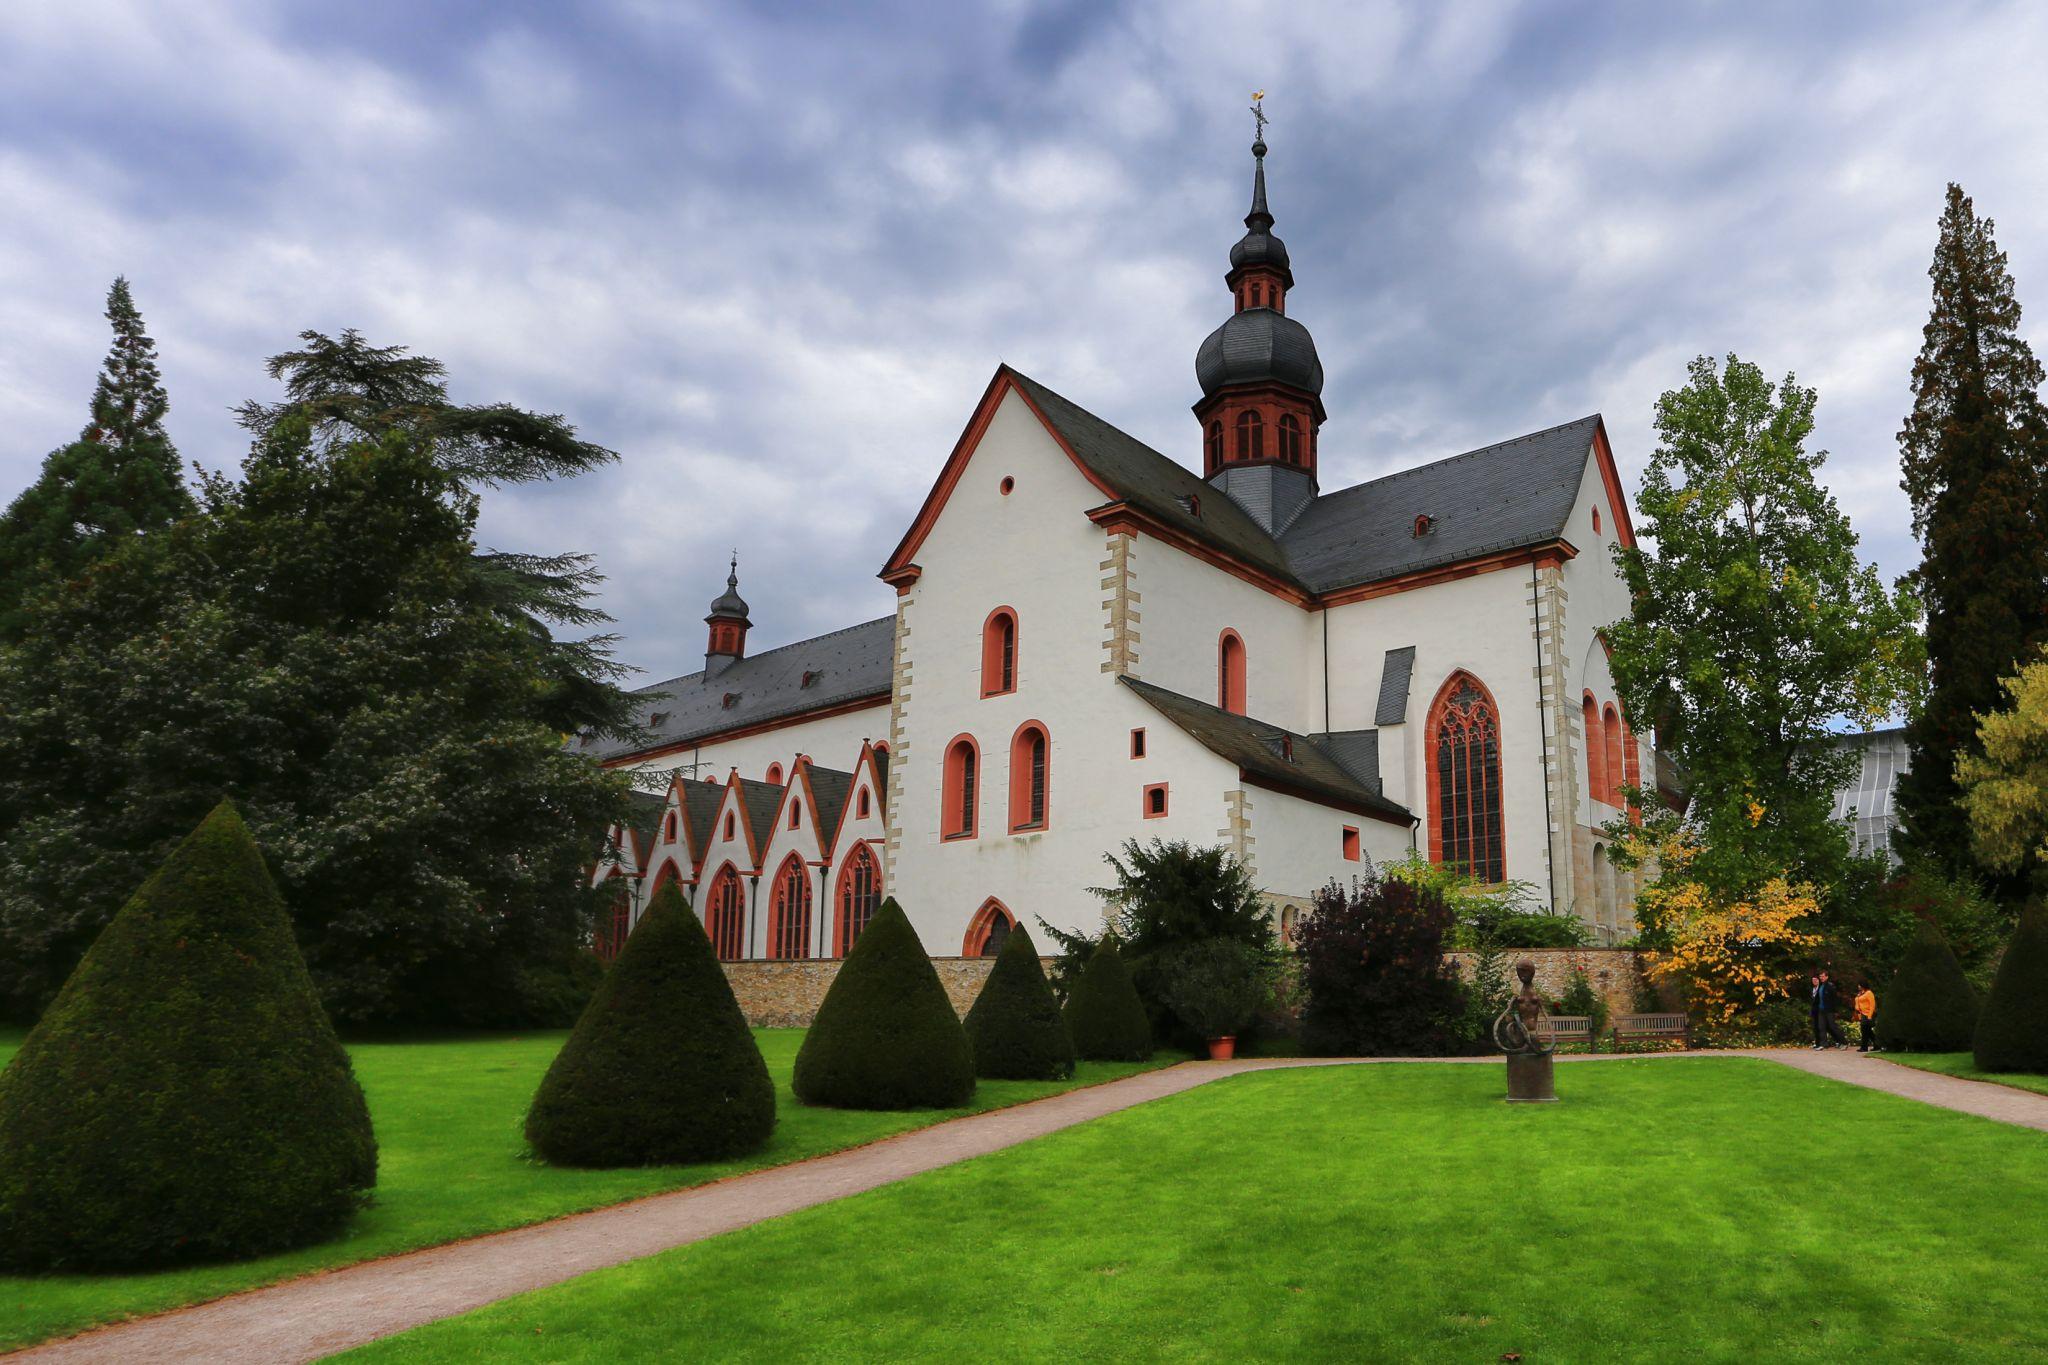 Eberbach Abbey, Germany